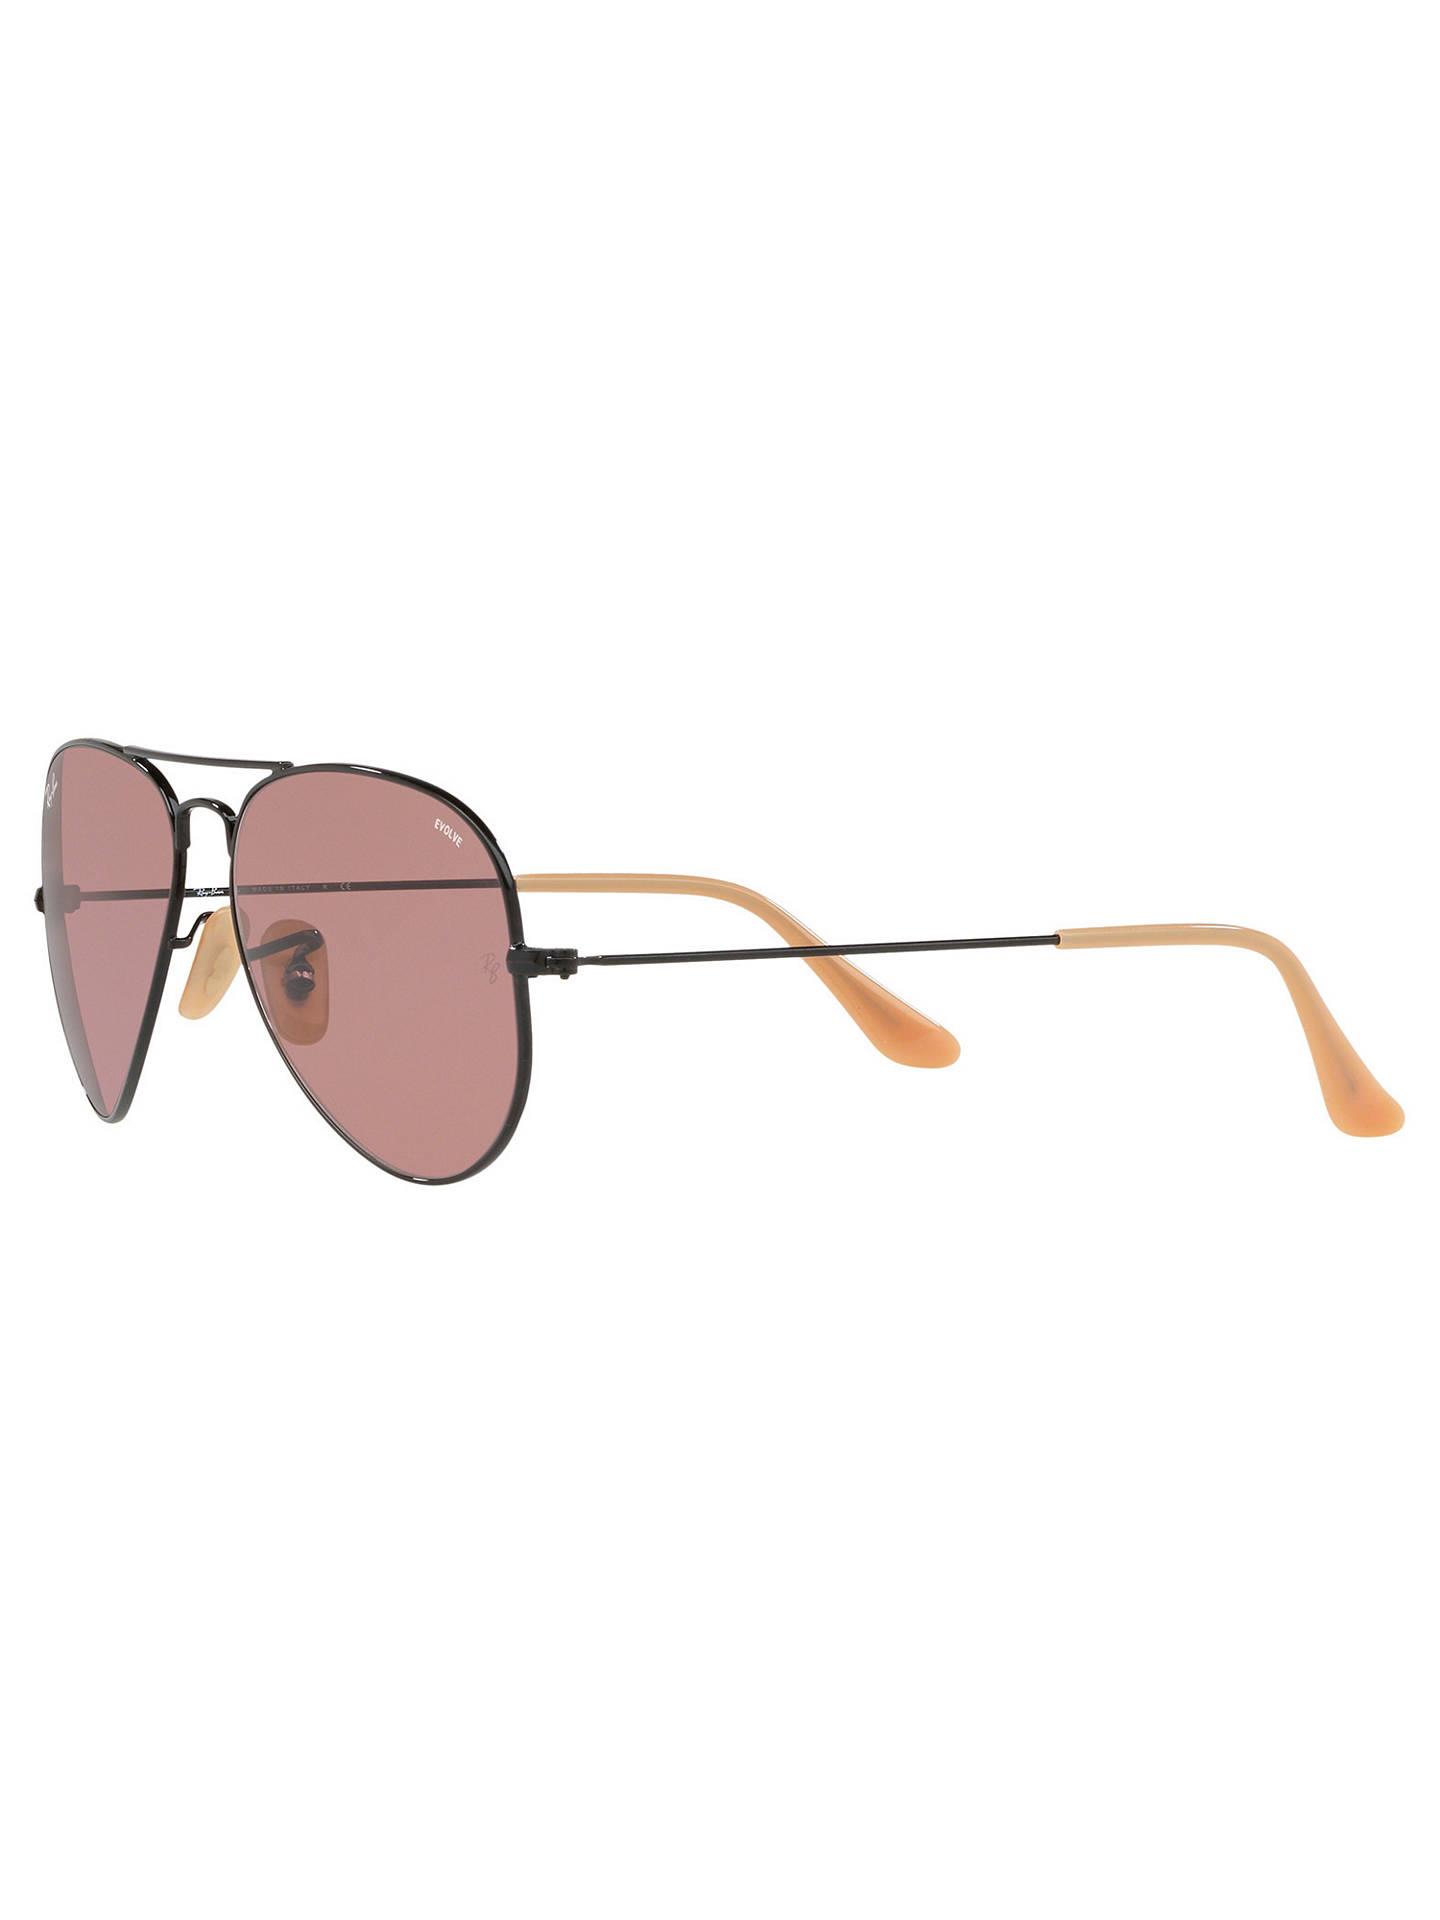 13dbd13ae8c28 ... Buy Ray-Ban RB3025 Men s Evolve Aviator Sunglasses